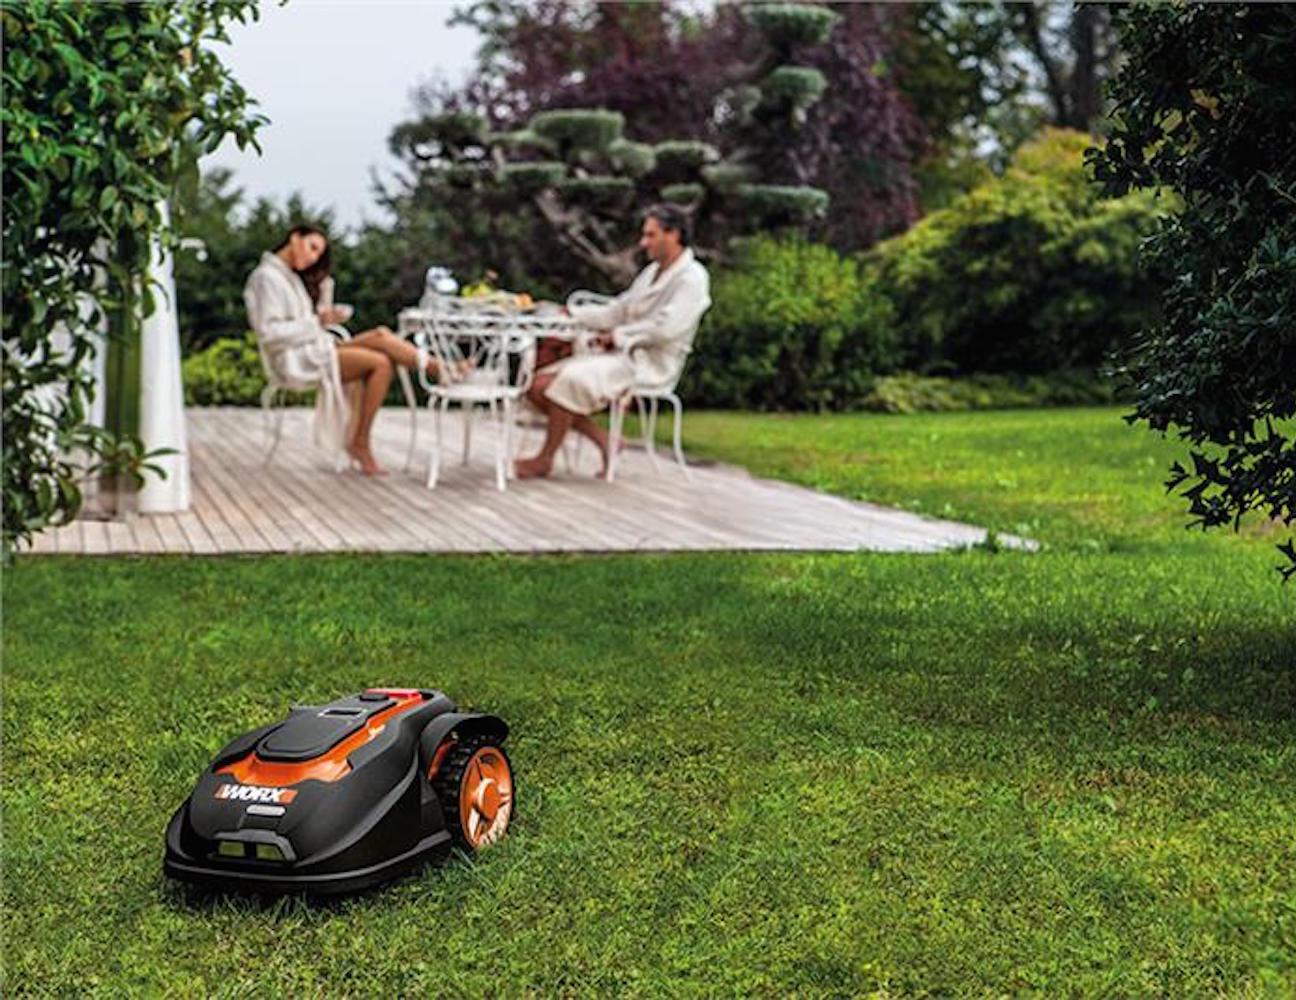 WORX Landroid – Robotic Lawn Mower